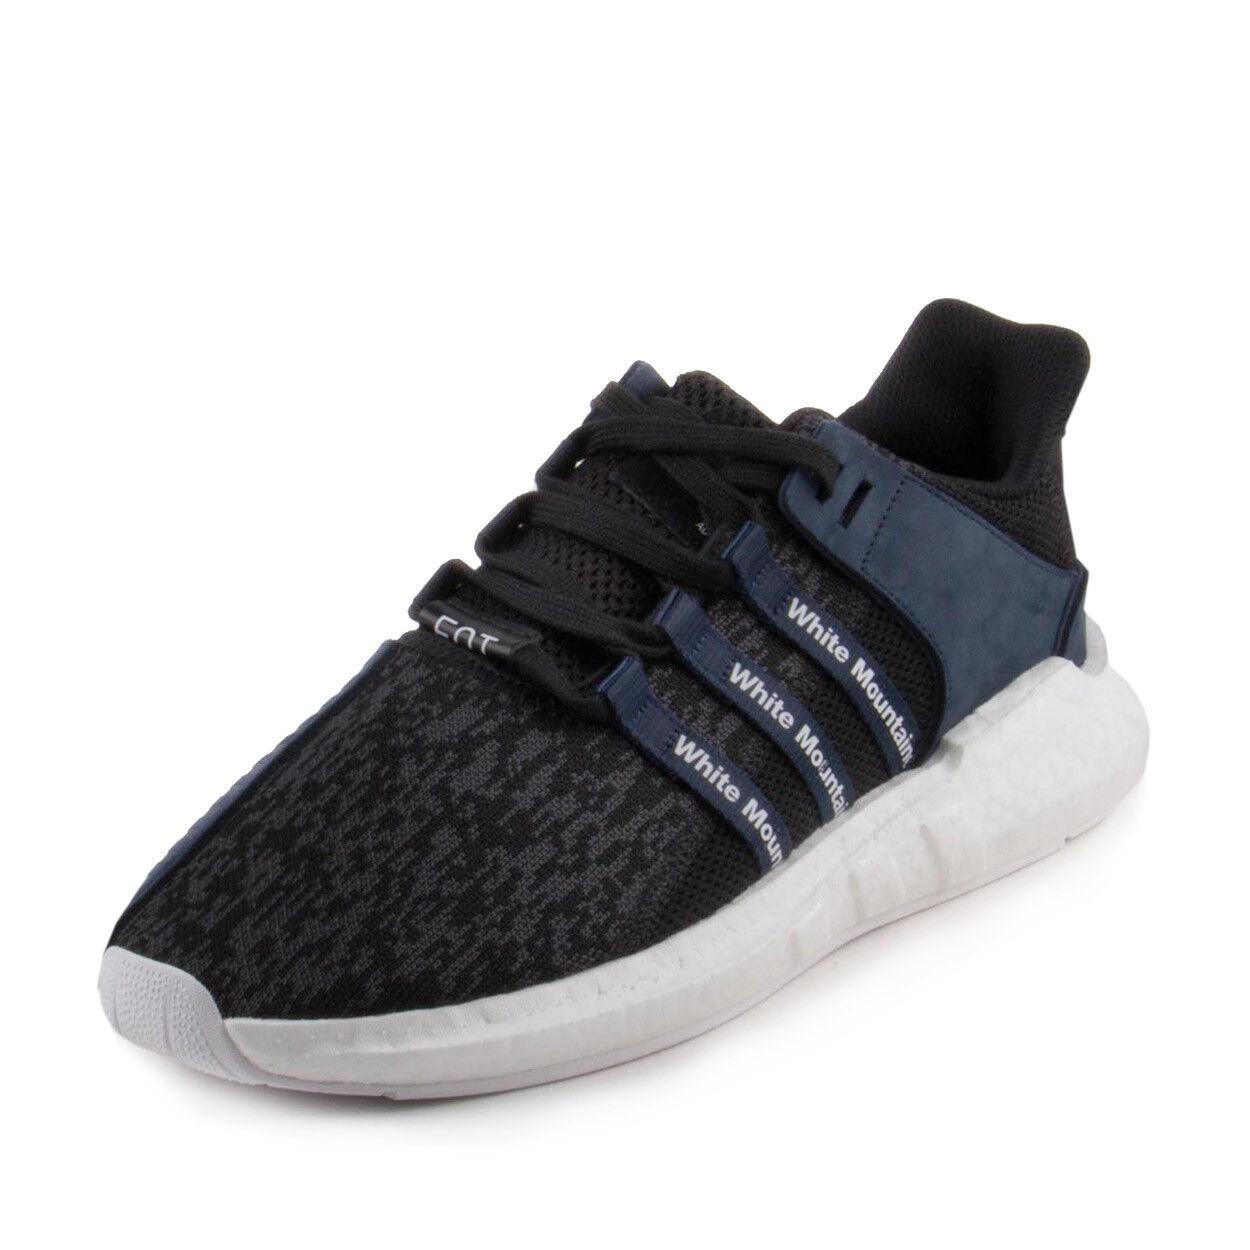 Adidas Mens WM EQT Support Future White Mountaineering Navy Black BB3127